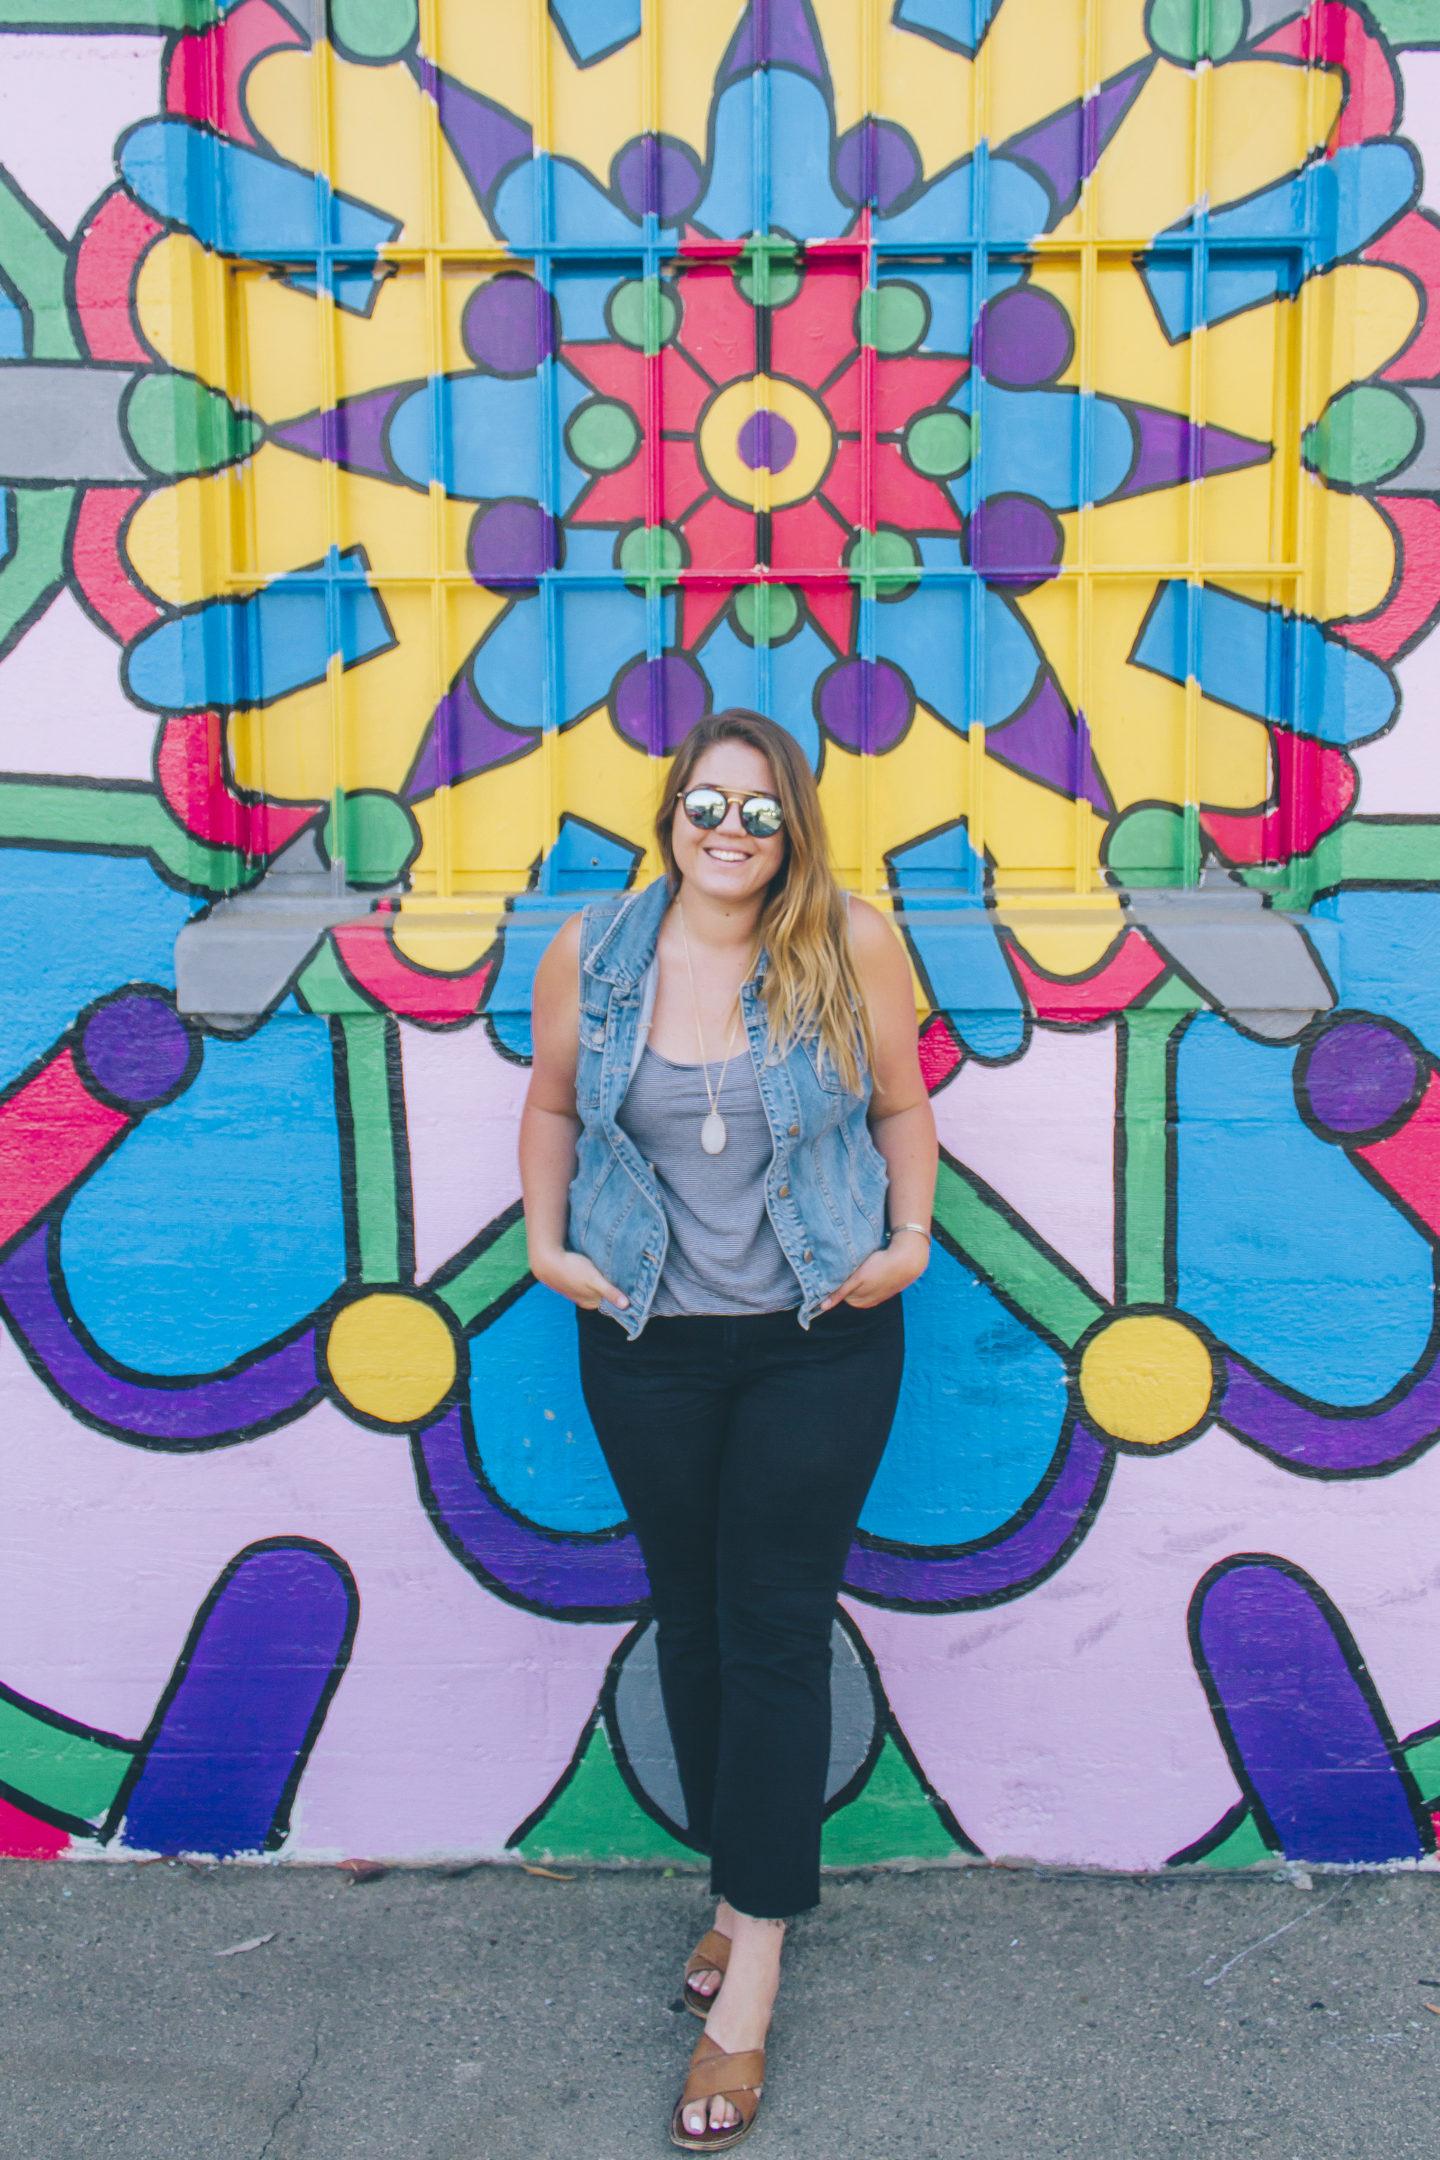 The Coolest Wall in Orange County, Denim on Denim + A Link Up // wanderabode.com